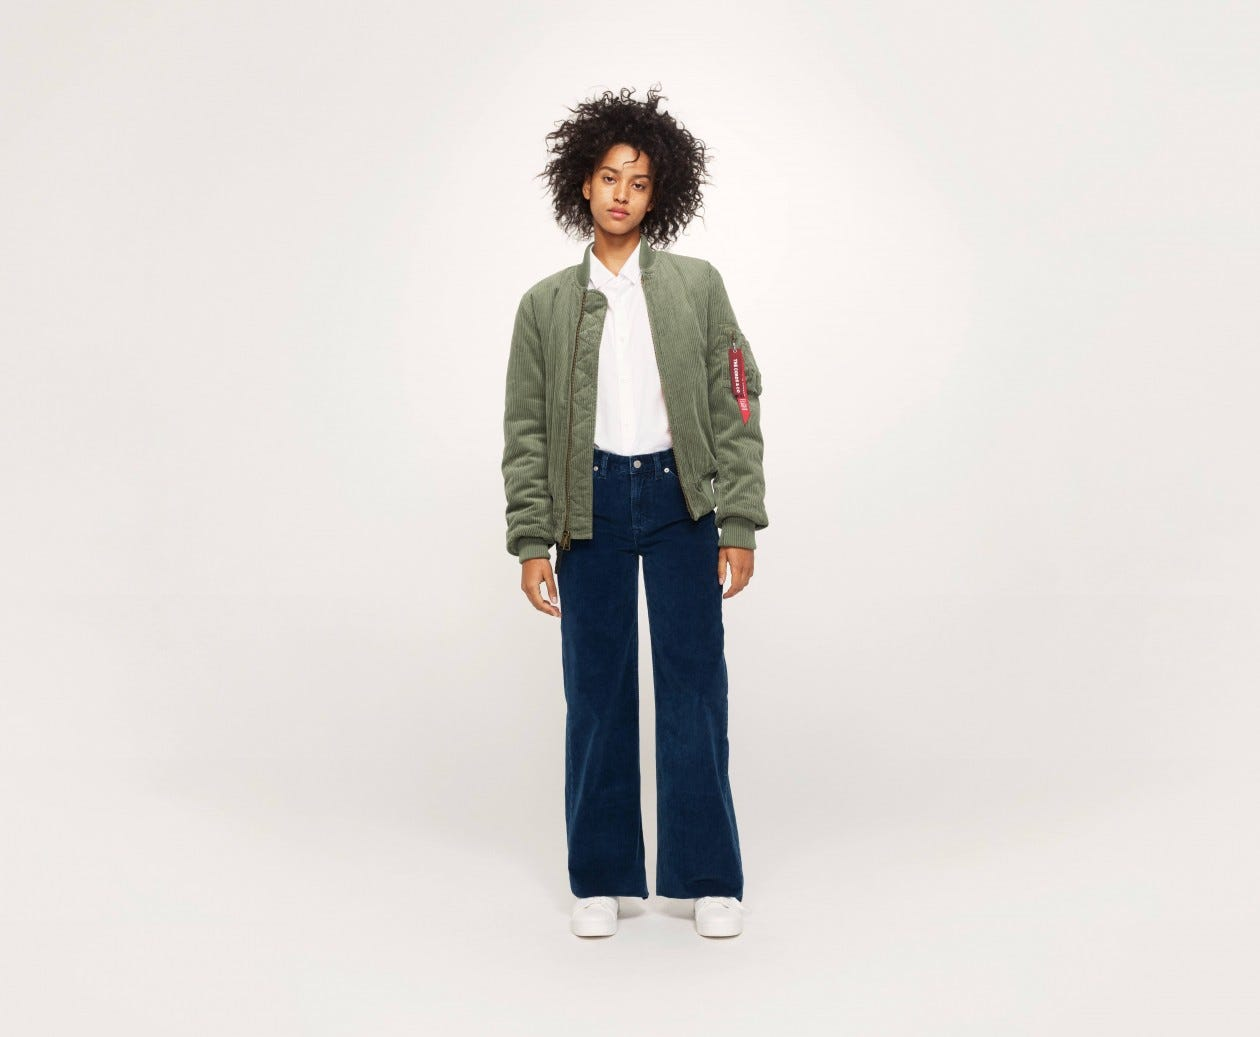 43ae2aa191b Biggest Fashion Trends 2018, Satin Dress, Women Suits